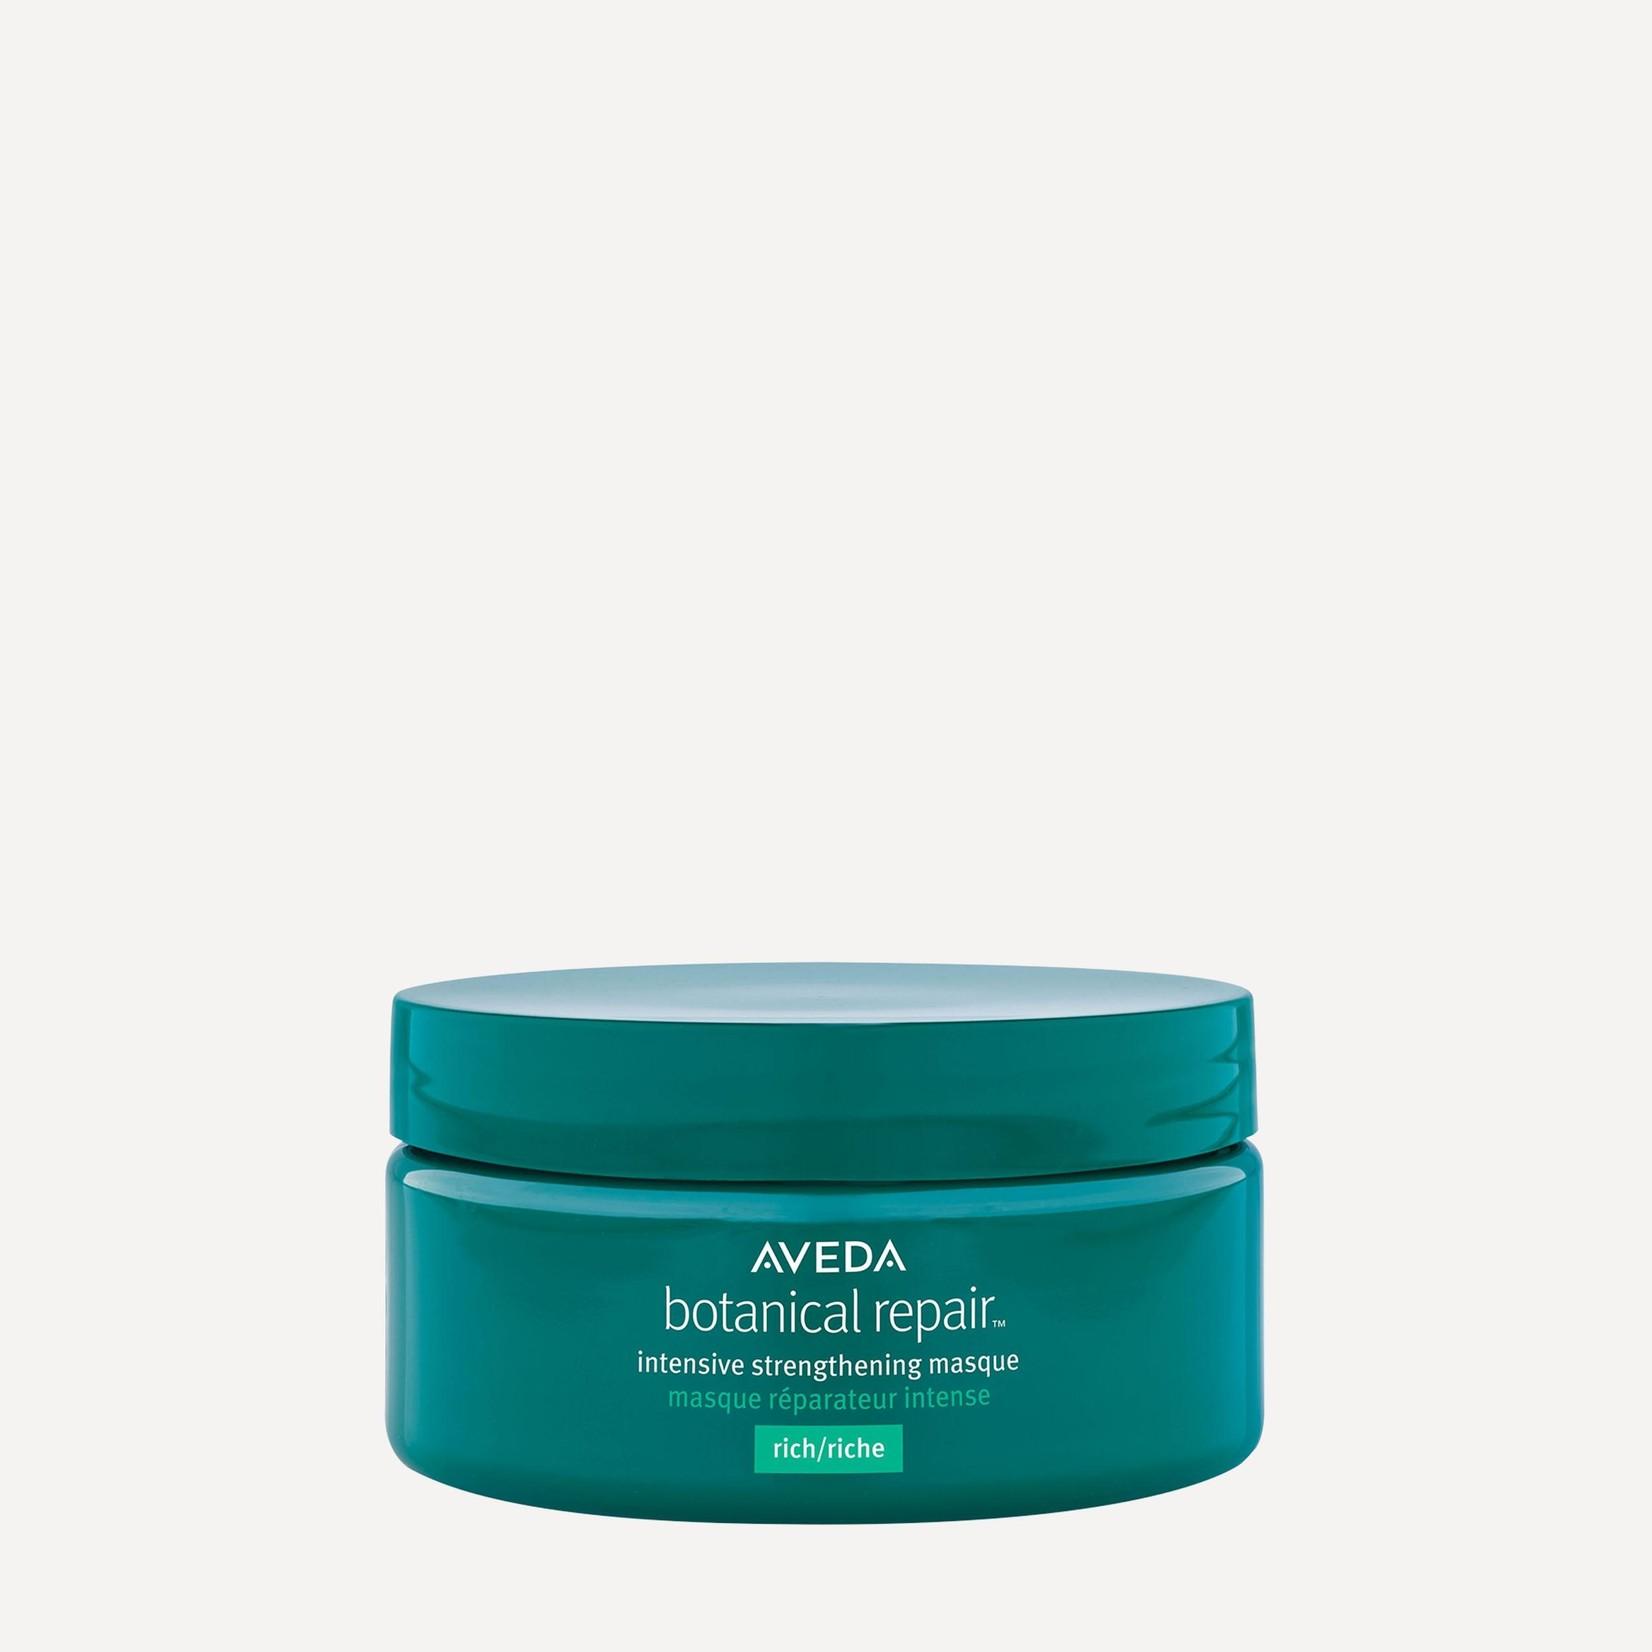 AVEDA Botanical Repair™ Intensive Masque: Rich